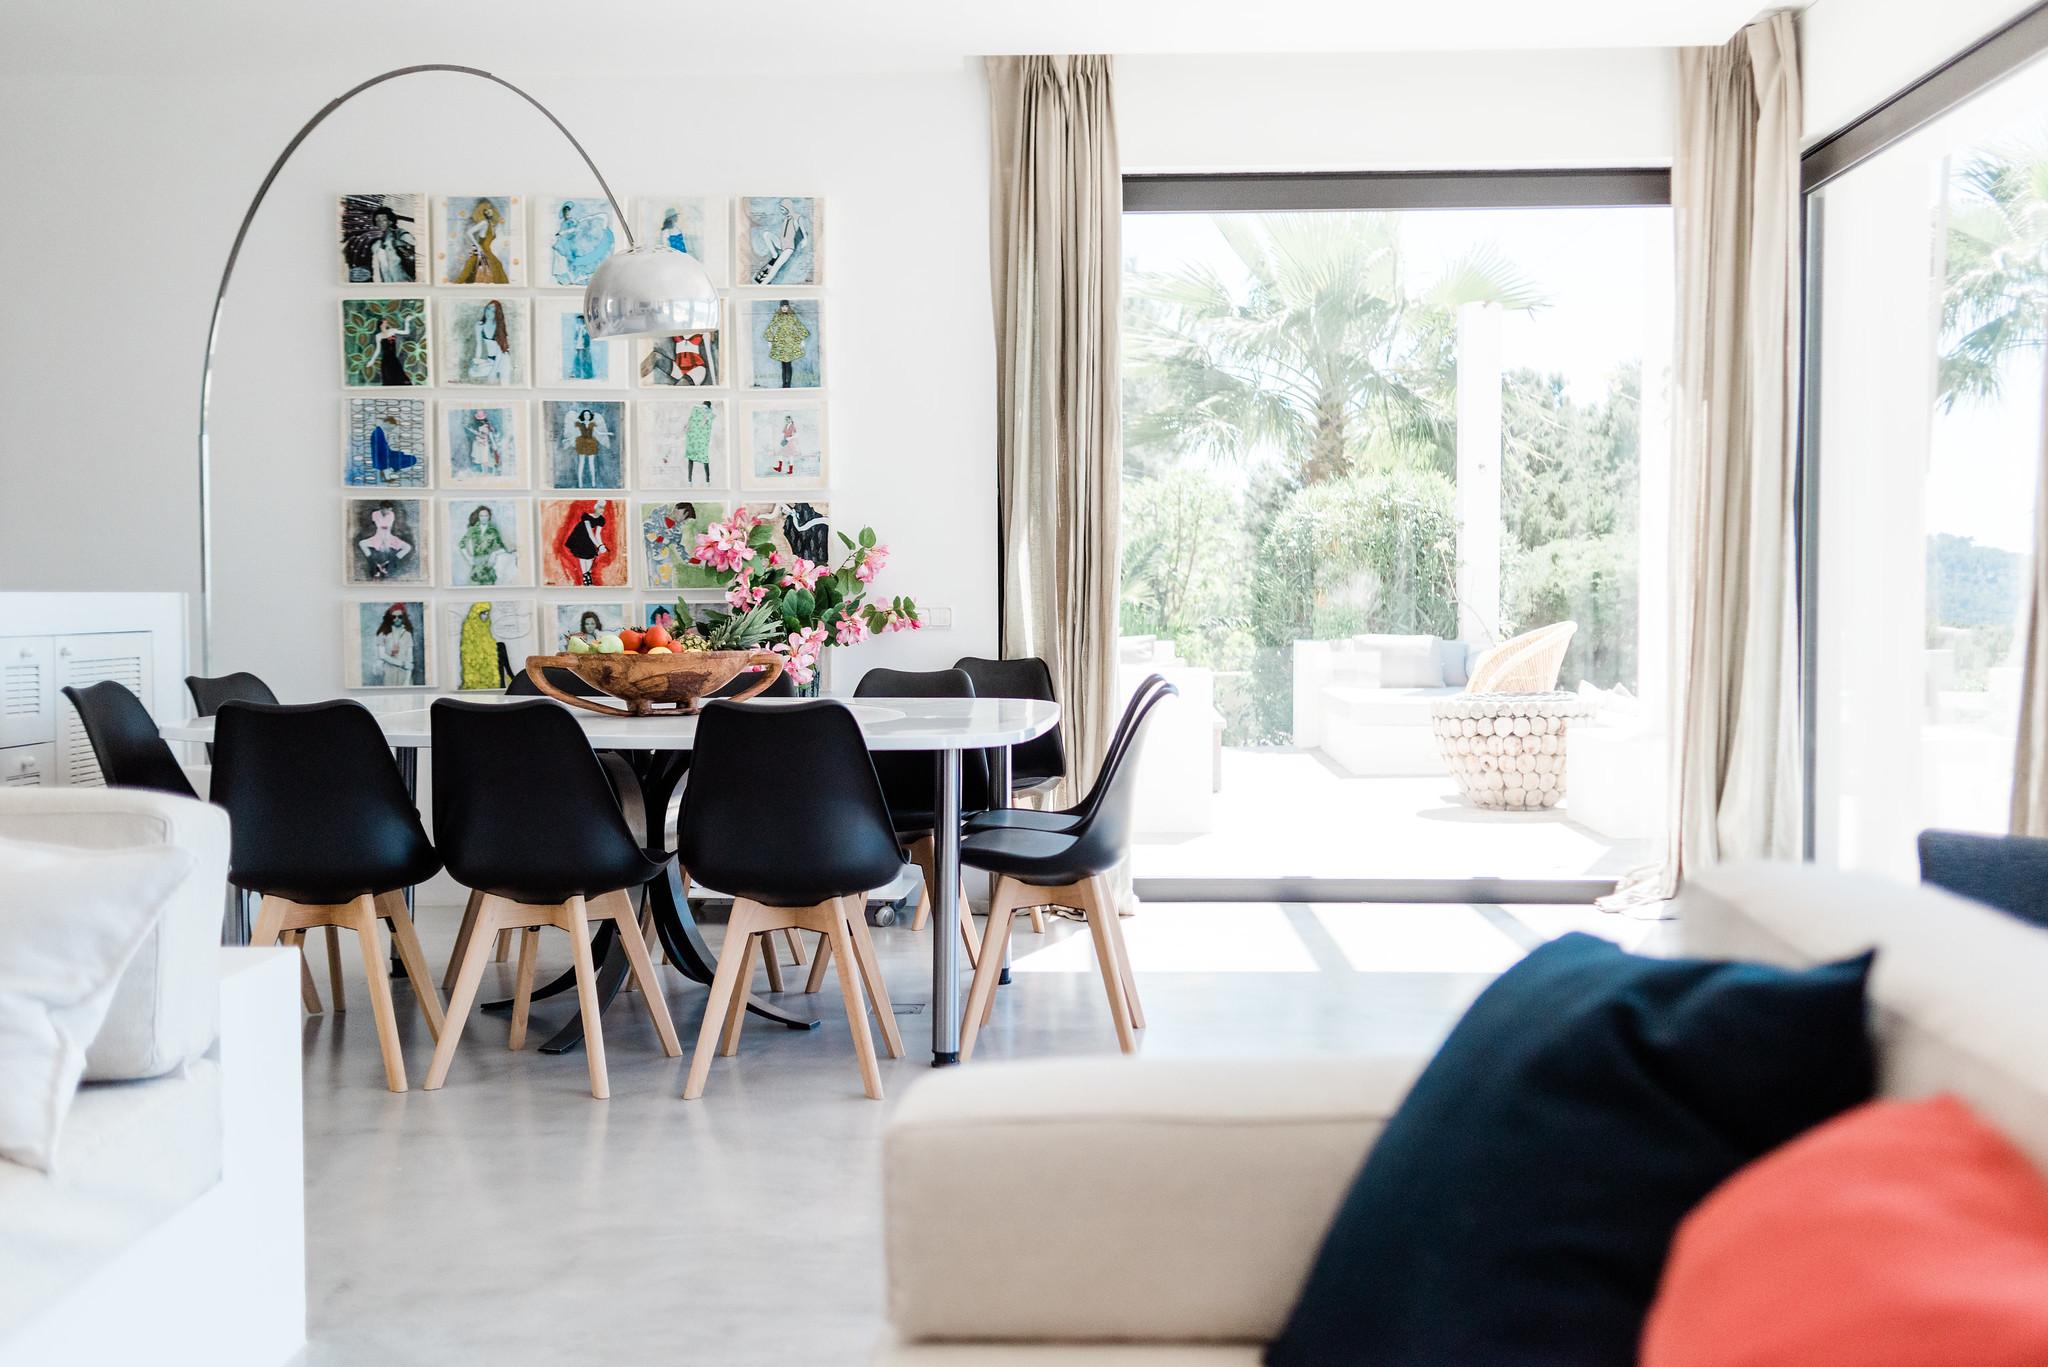 https://www.white-ibiza.com/wp-content/uploads/2020/06/white-ibiza-villas-casa-nyah-interior-livingspace.jpg